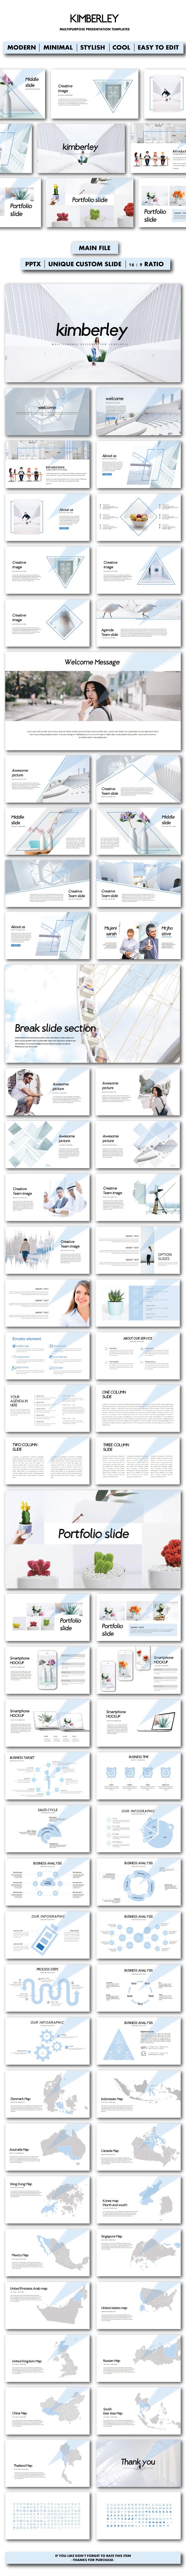 GraphicRiver Kimberley Google Slides Templates 20995810